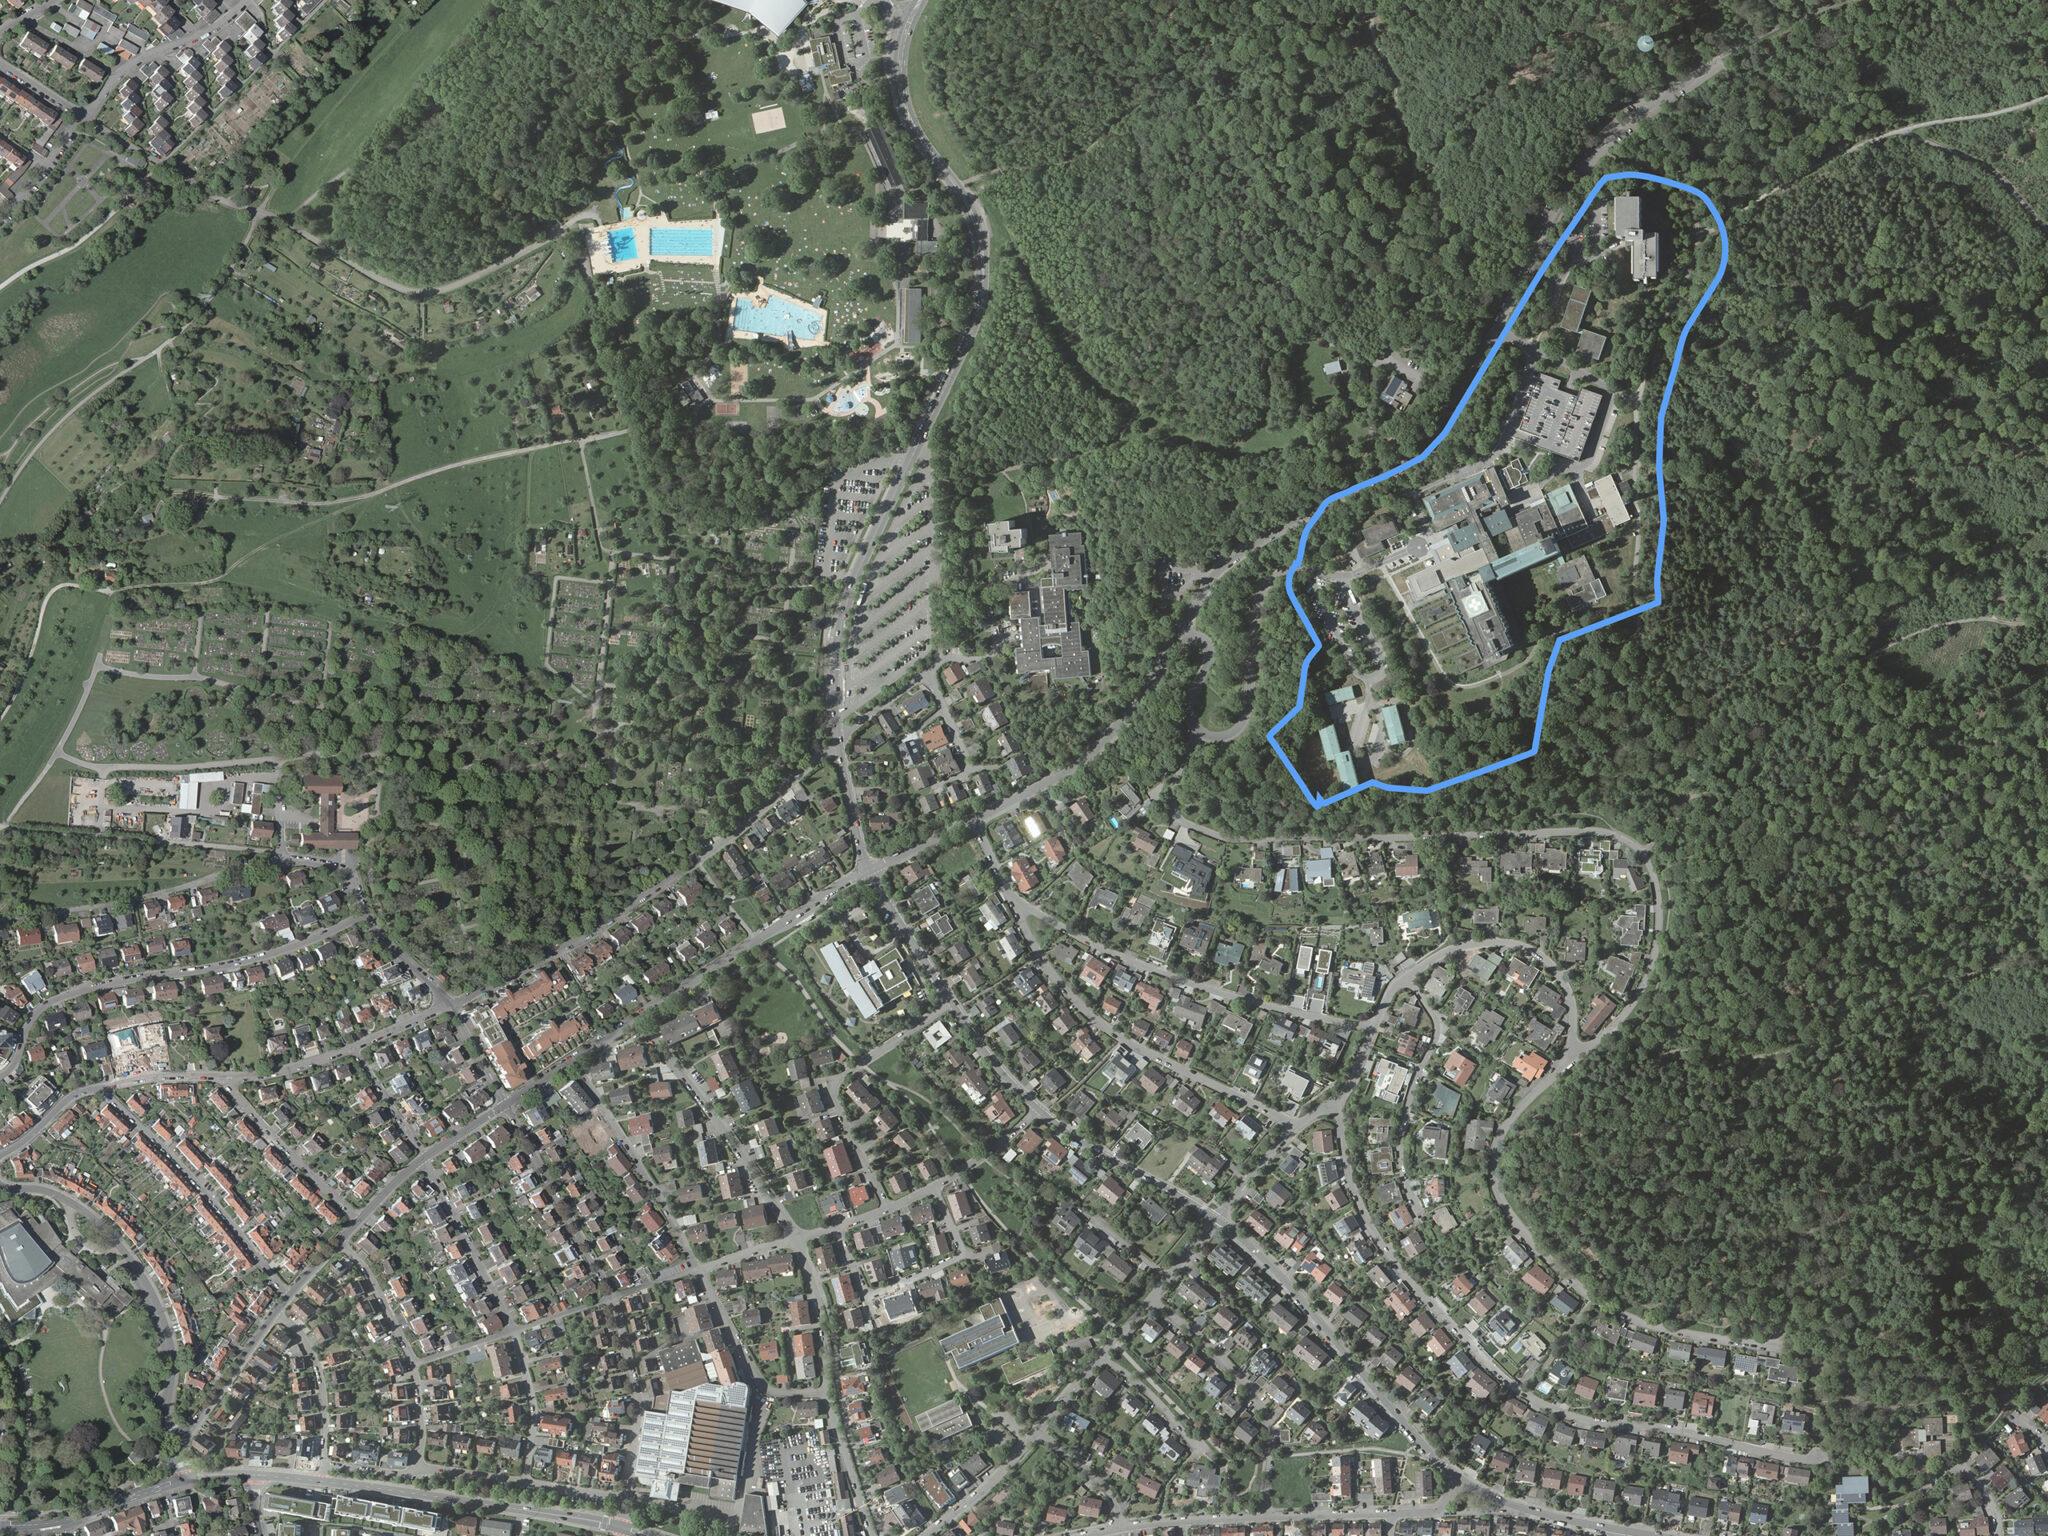 Luftbild Krankenhaus Areal Sindelfingen